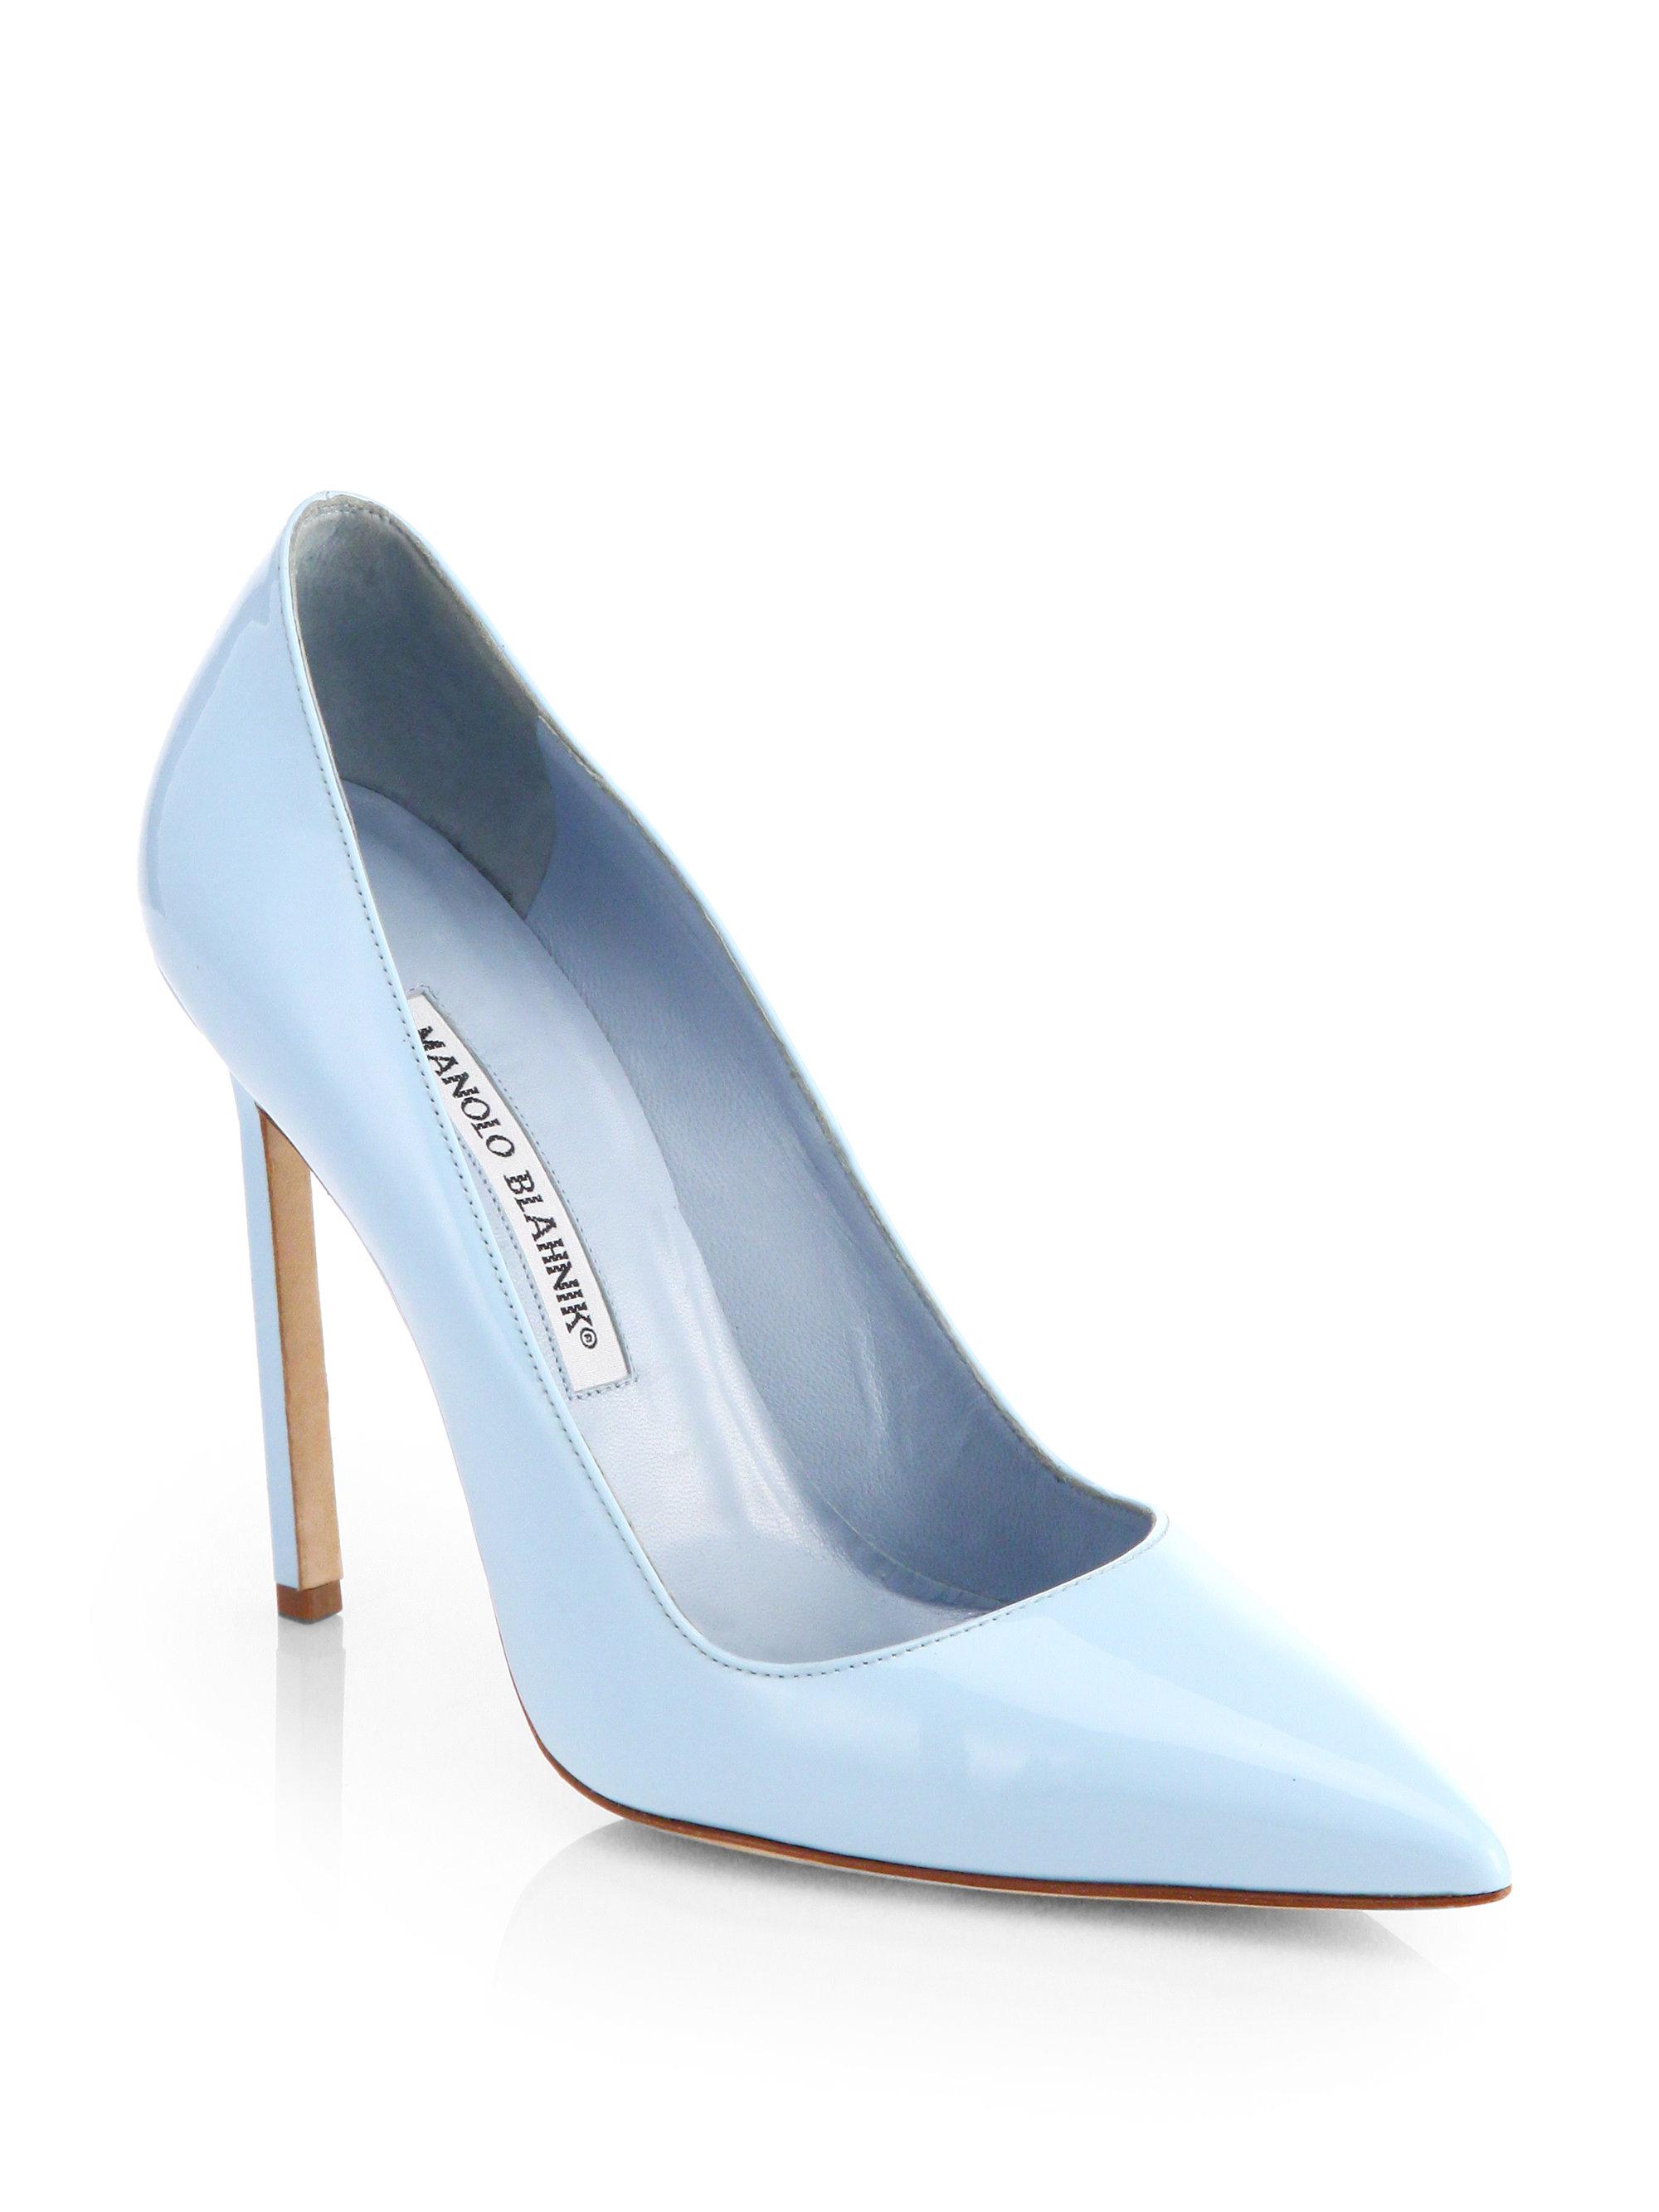 Pale Blue High Heel Shoes